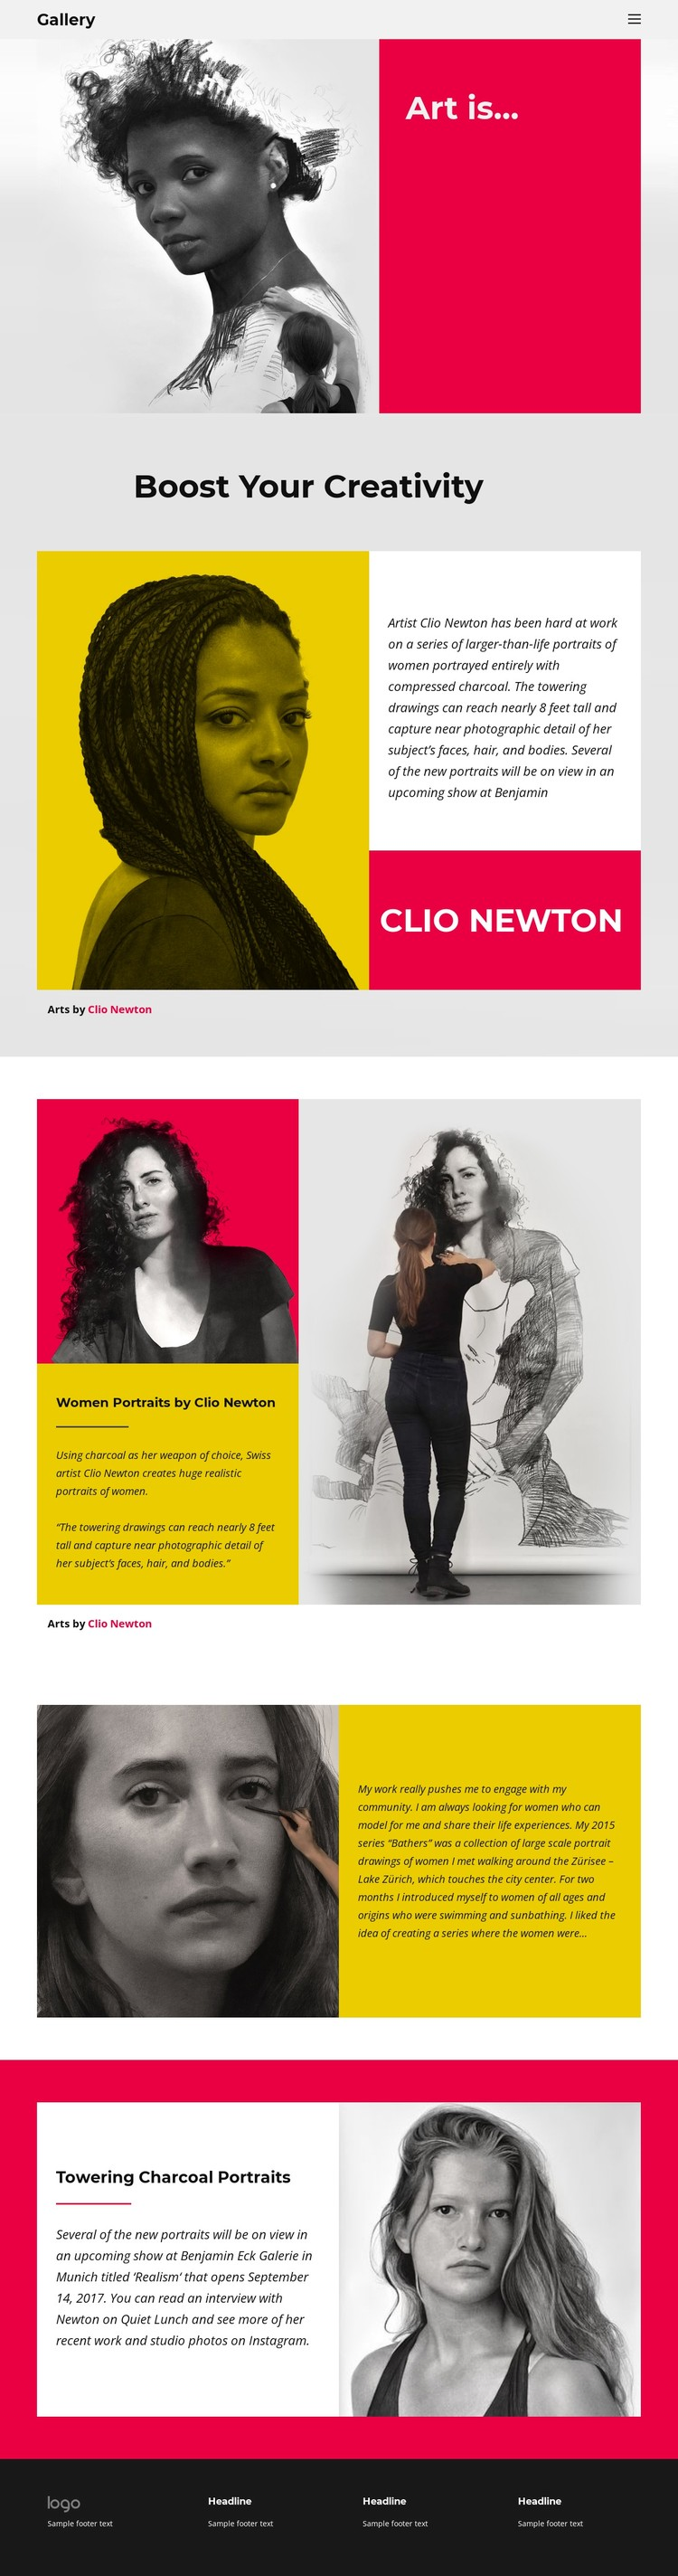 Charcoal Portraits WordPress Template